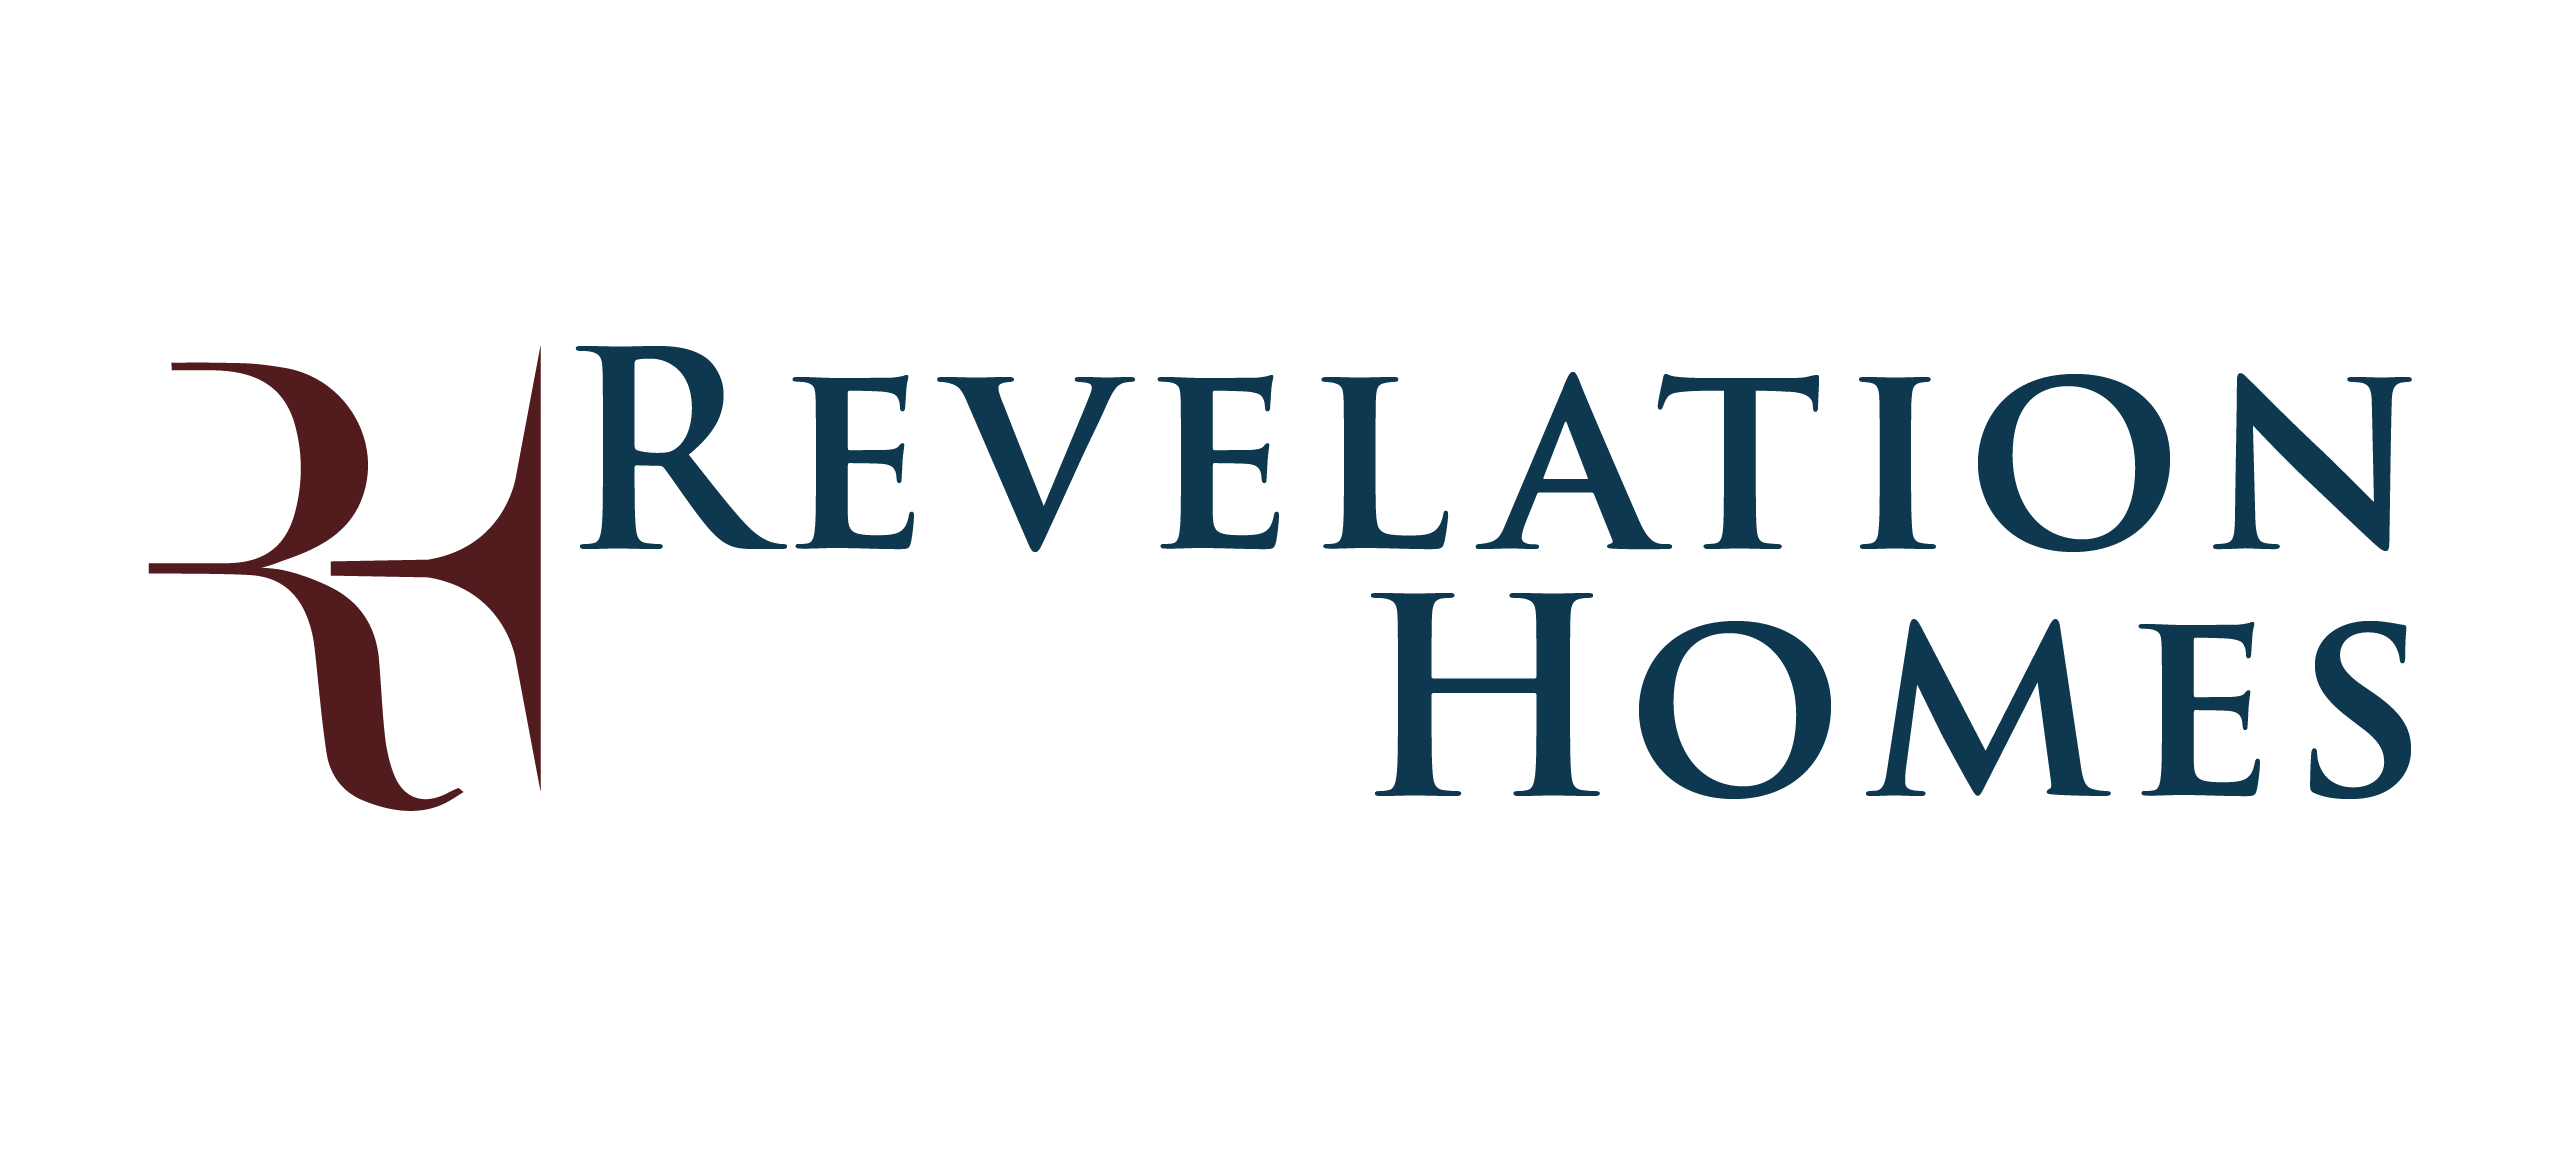 Revelation Homes 3to1 Logo